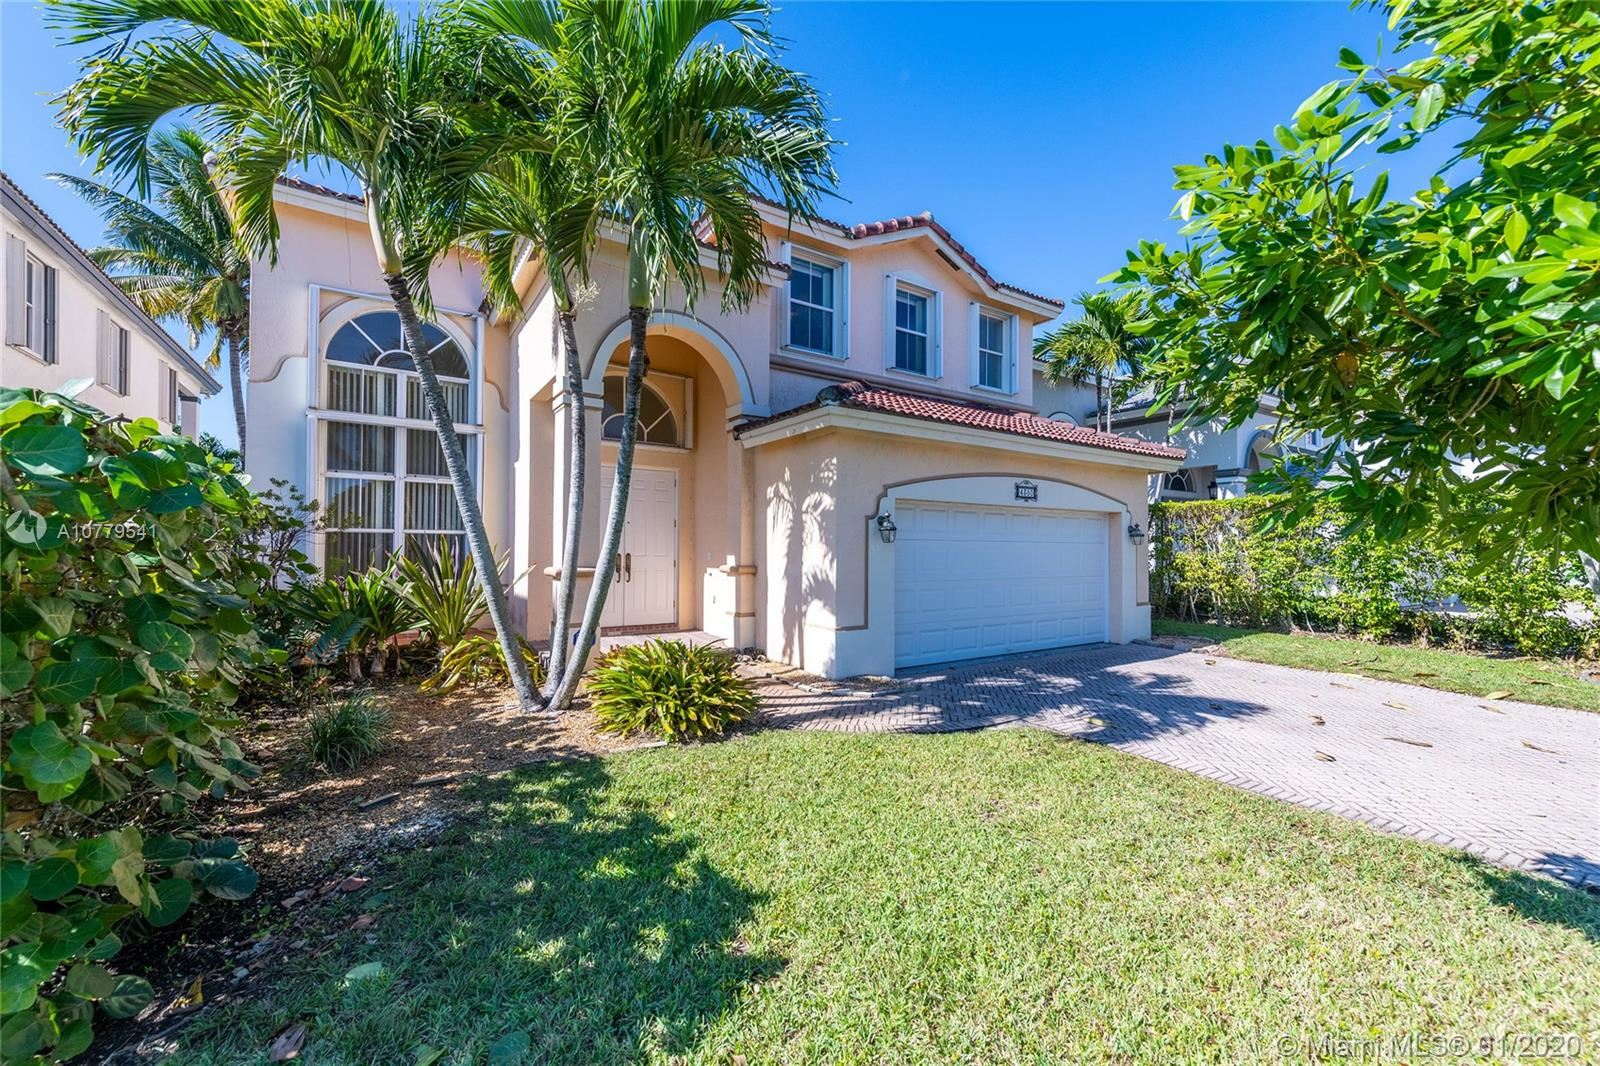 4350 SW 161st Pl, Miami, FL 33185 - #: A10779541